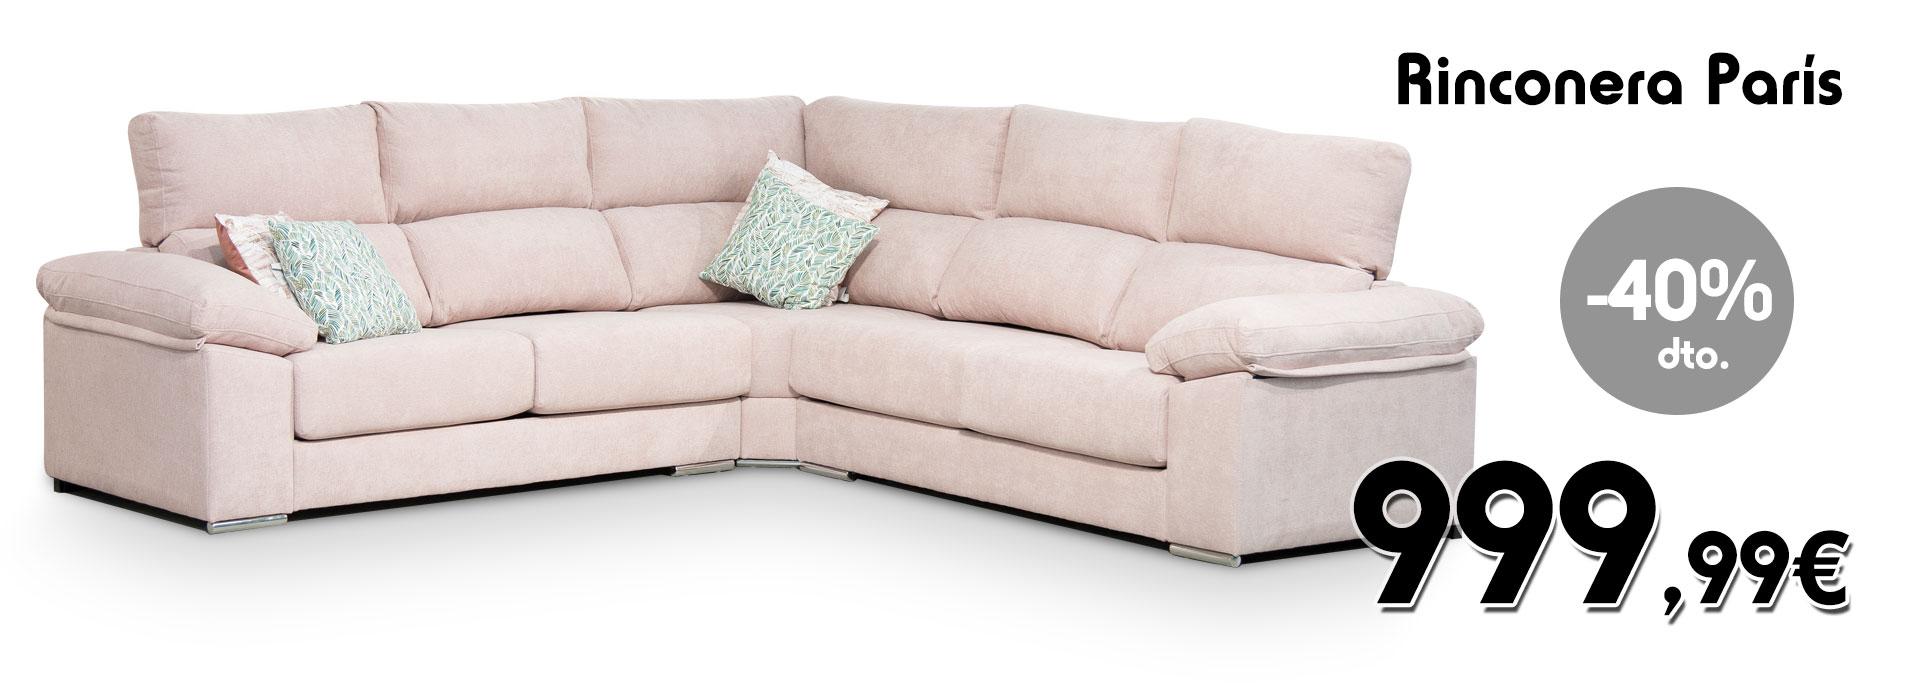 Sofa rinconera3